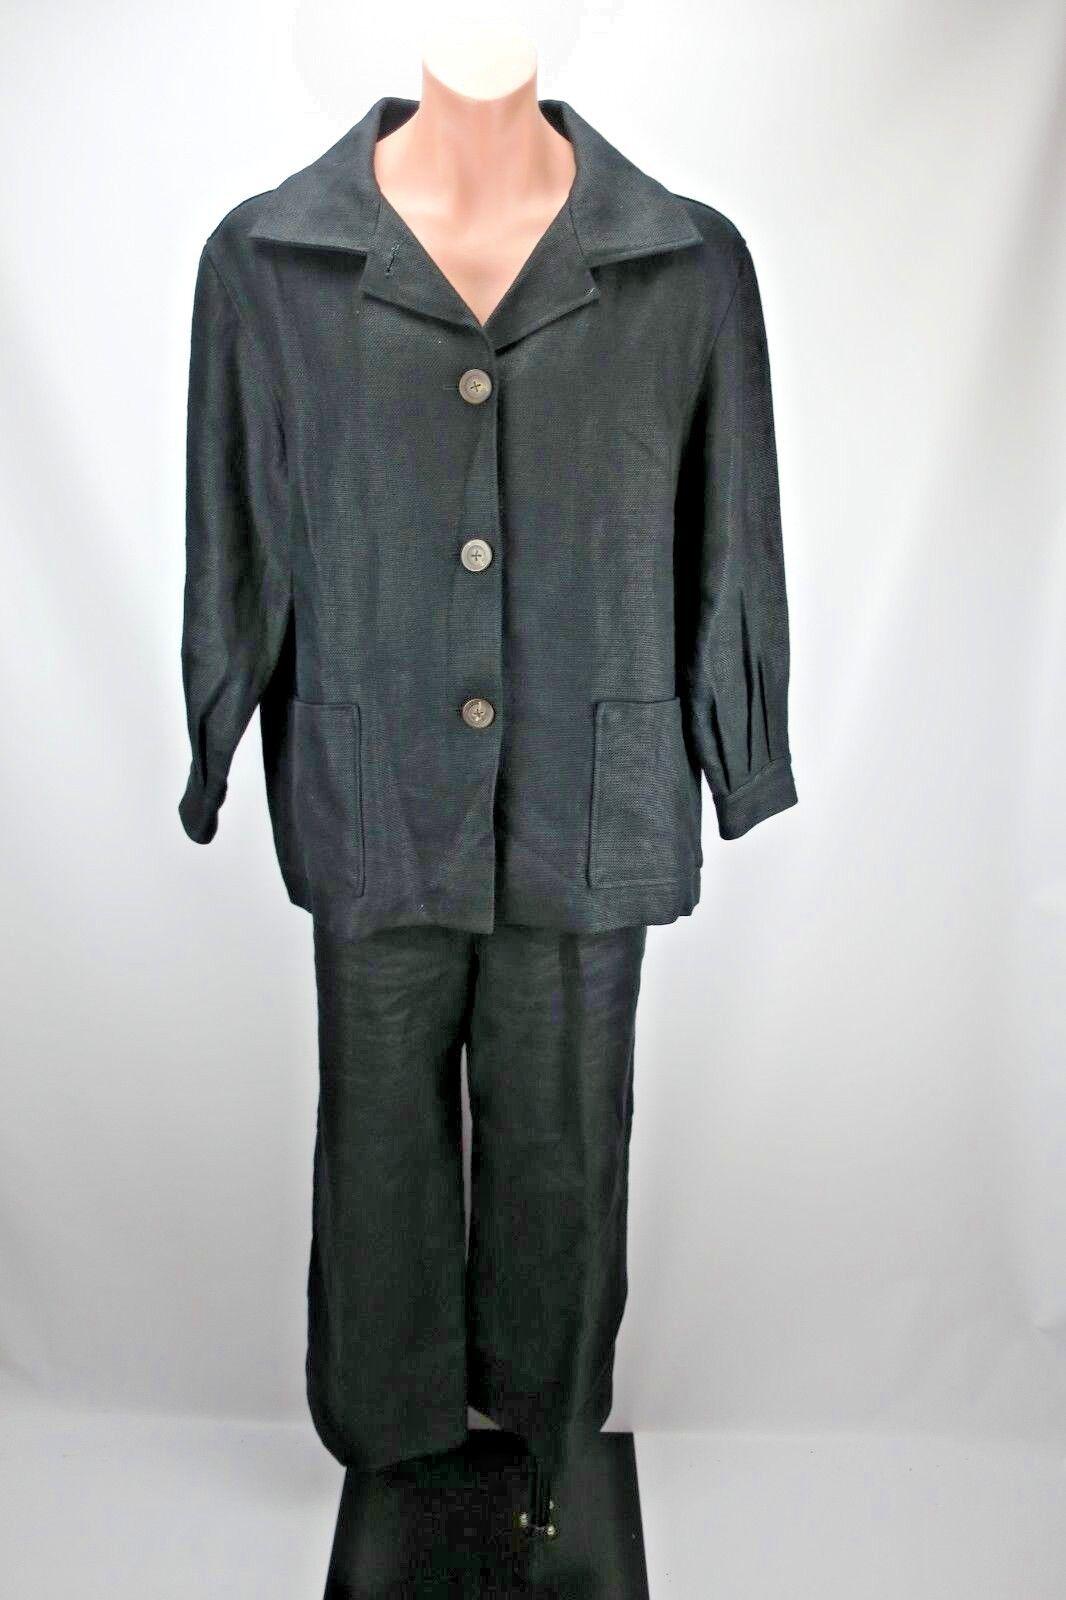 Oscar De La Renta Women's 100% Linen Suit 2pc Bergdorf Goodman Made  Sz 16